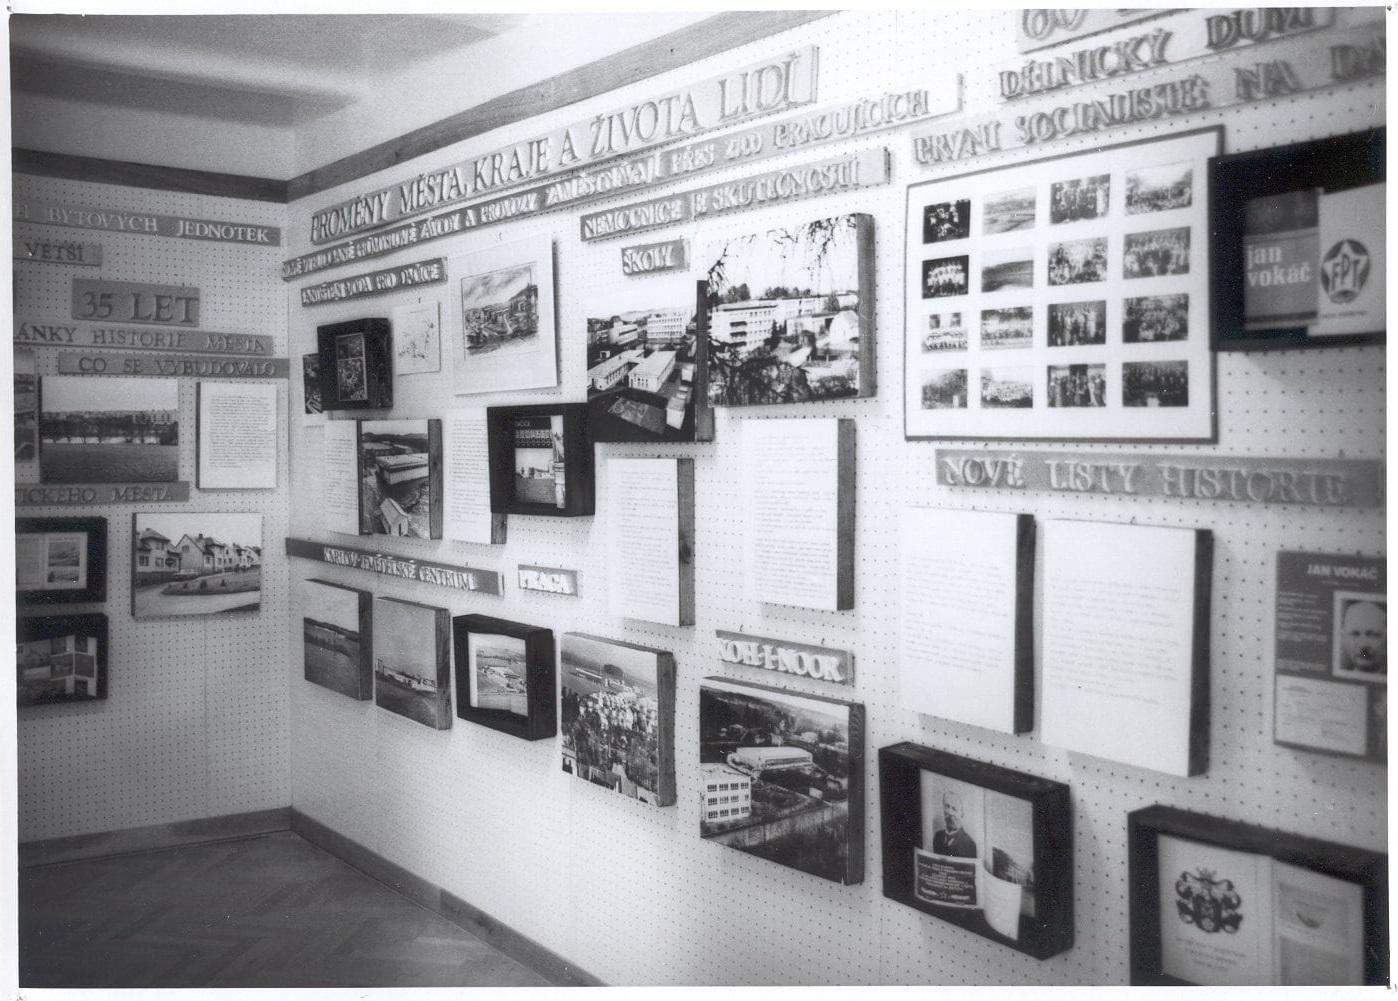 muzeum Dančice -historie